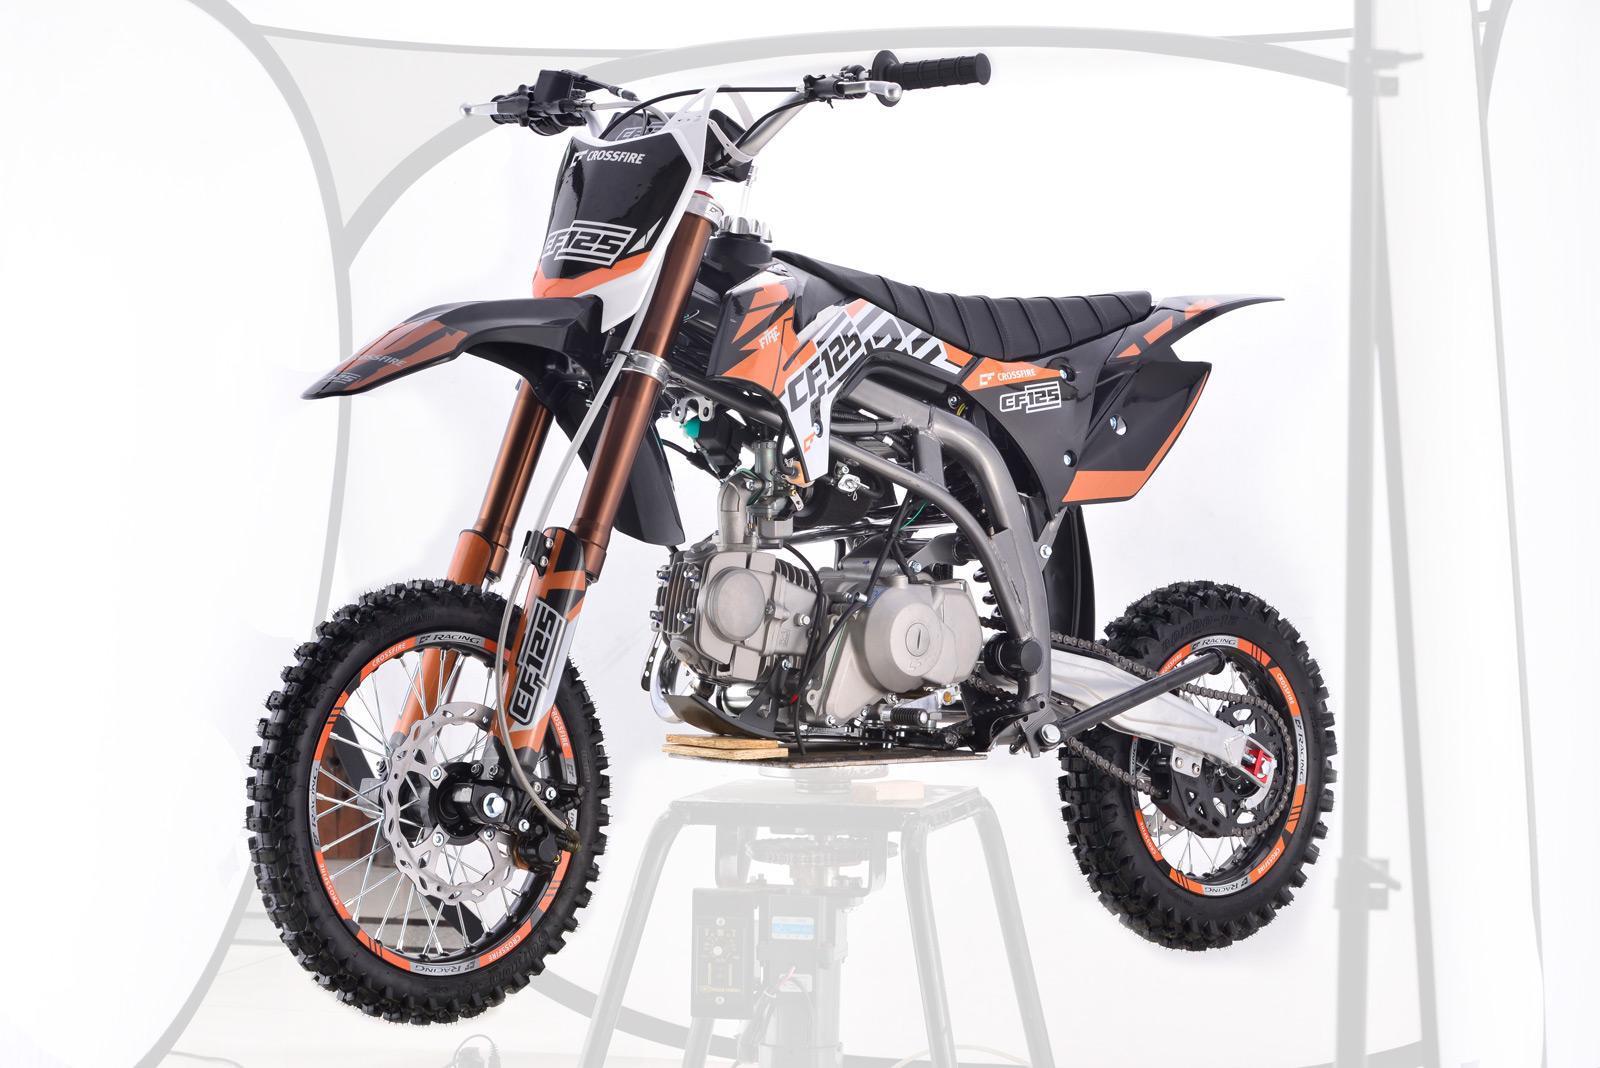 Crossfire CF125 2018-2019 Black - dirt bikes store chinchilla